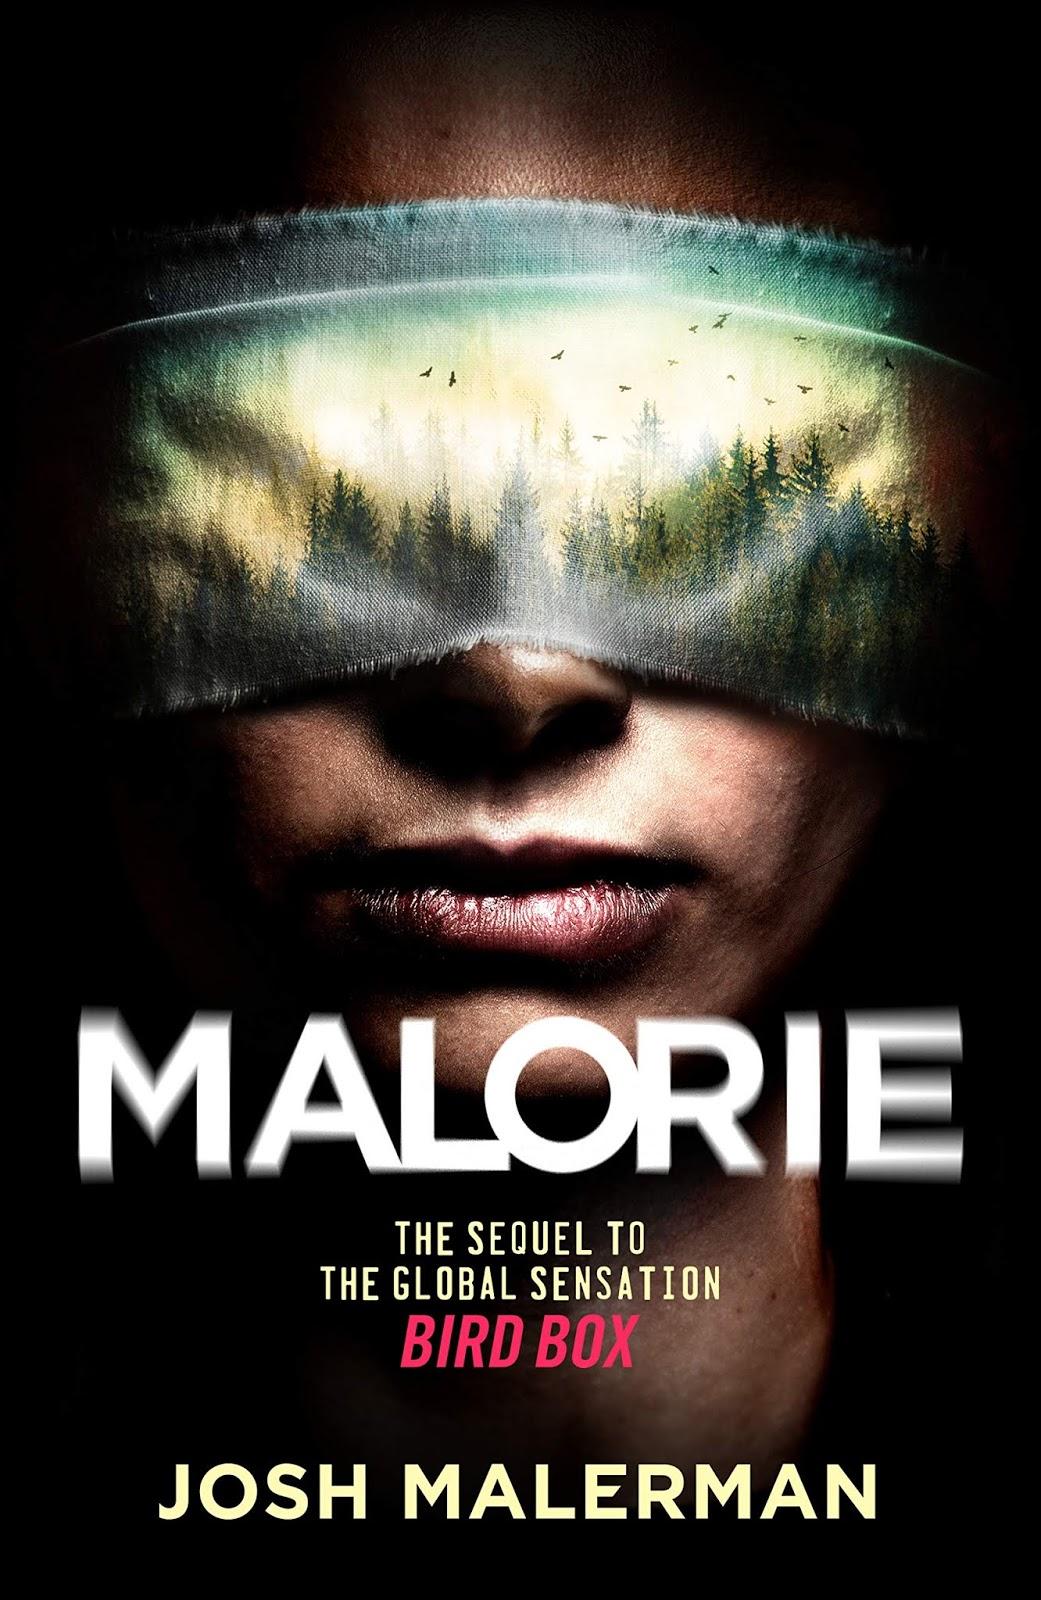 Malorie by Josh Malerman